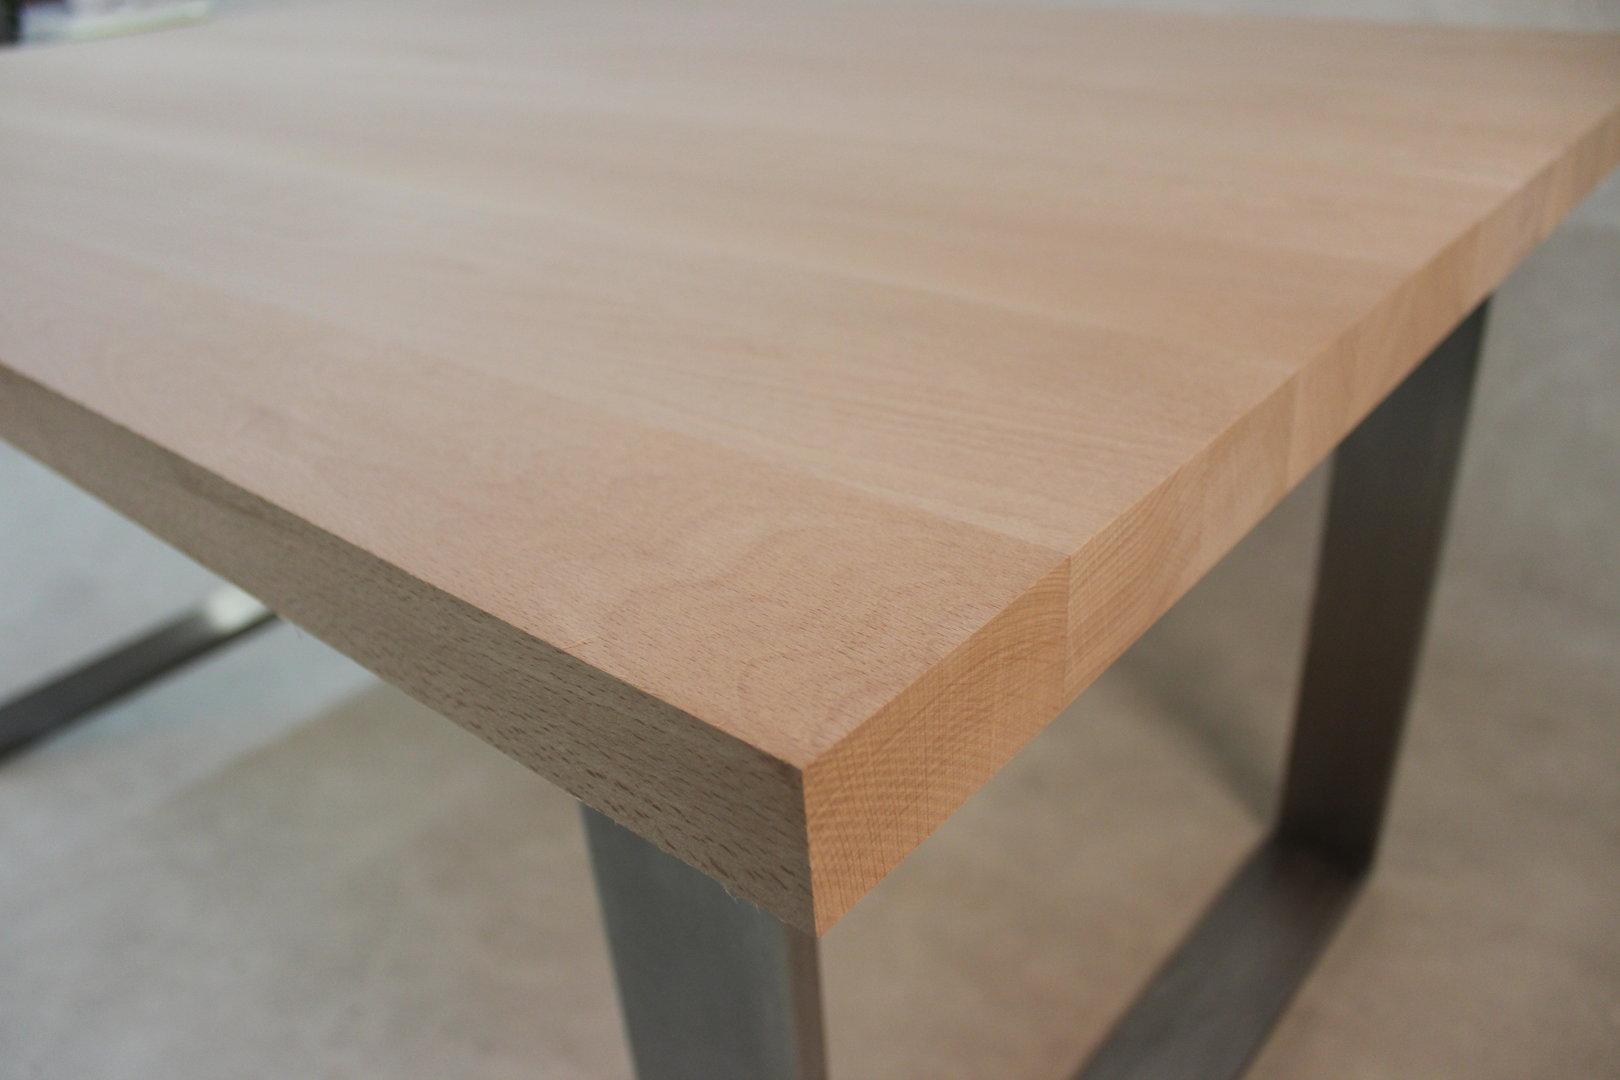 Tischplatte Massivholz Buche Dl Fsc 40 1800 1000